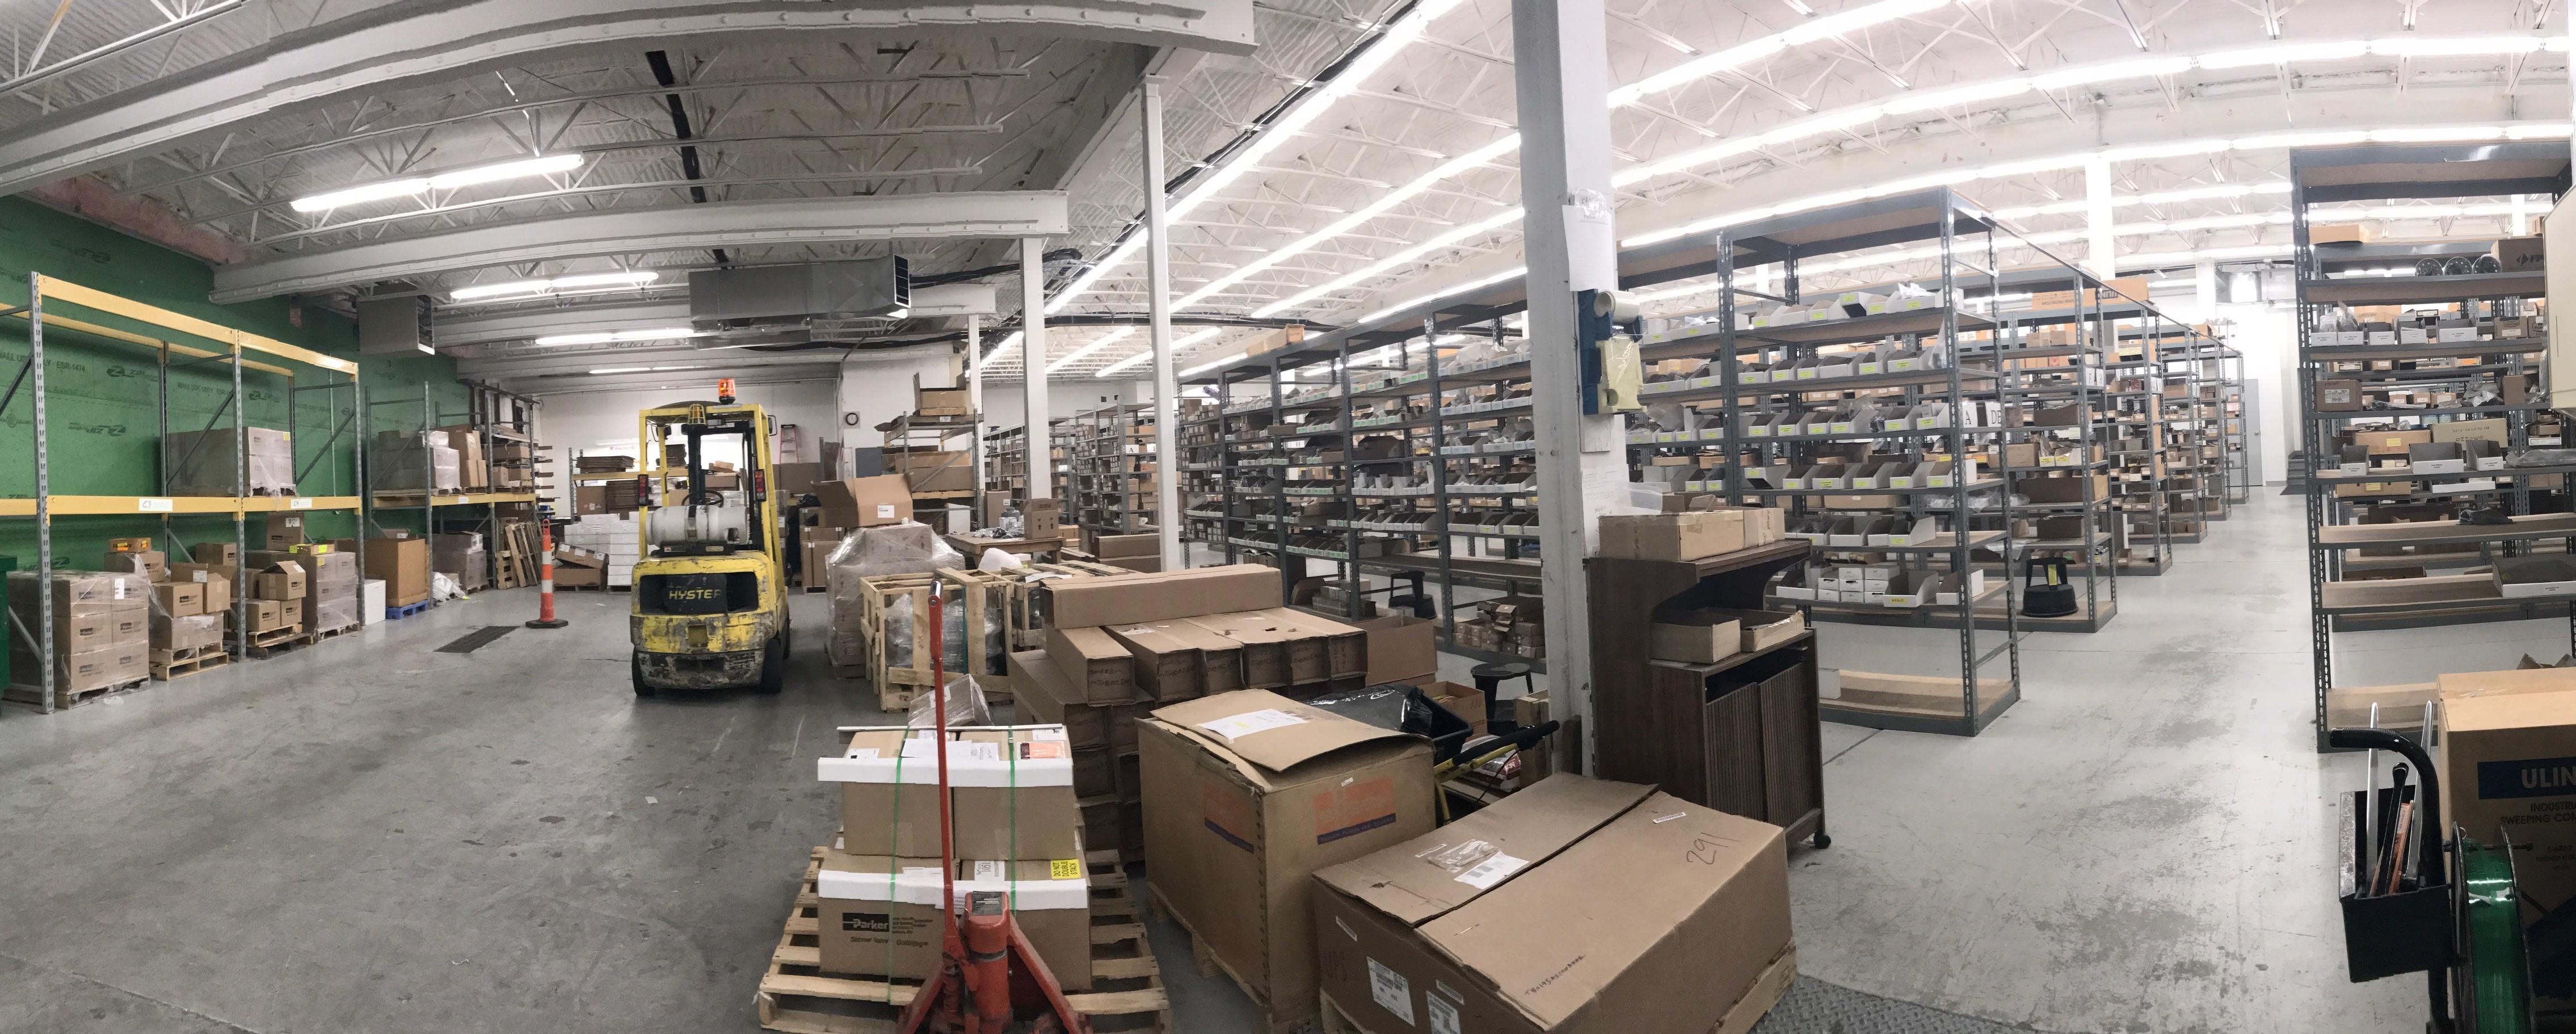 Skarda Equipment Co, Inc | LinkedIn